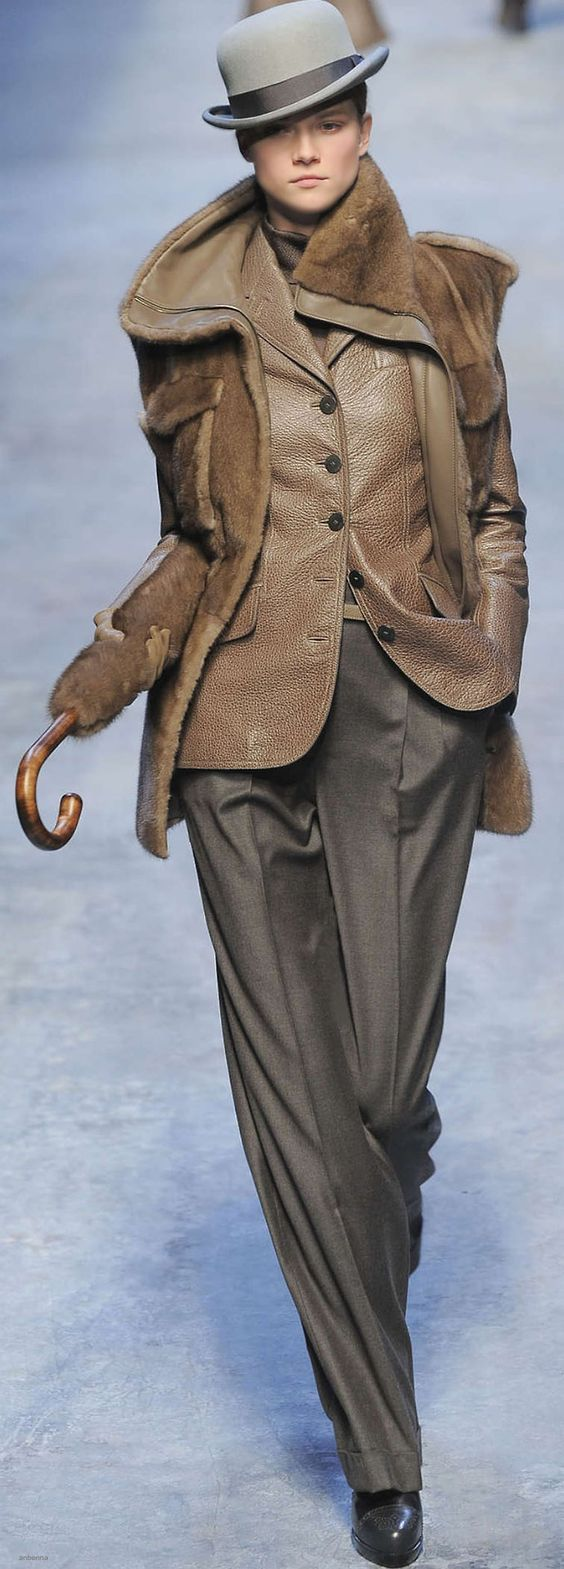 Hermes Fall Fashion show & more details